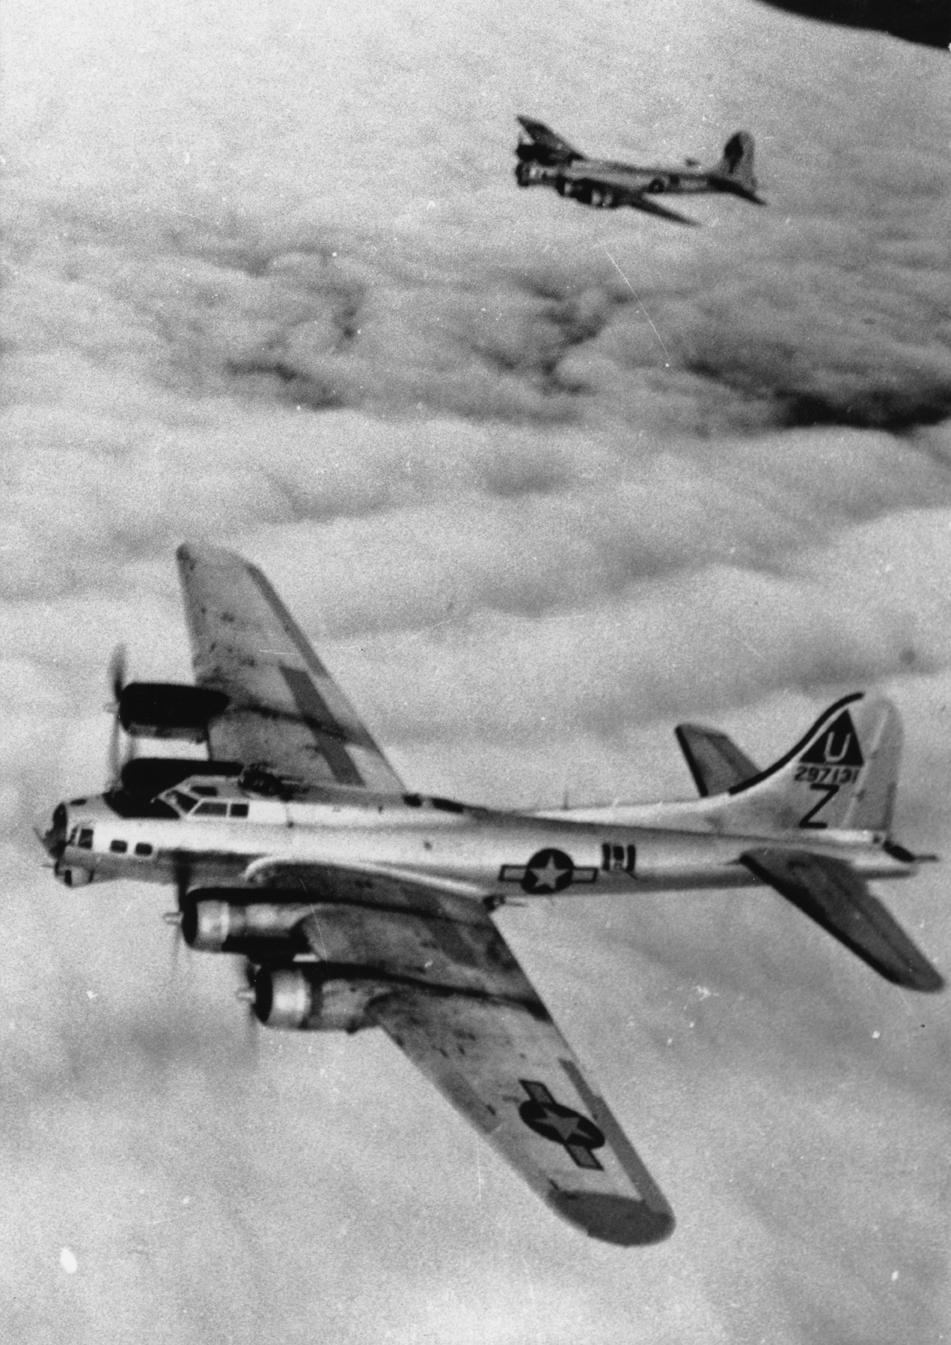 B-17 42-97131